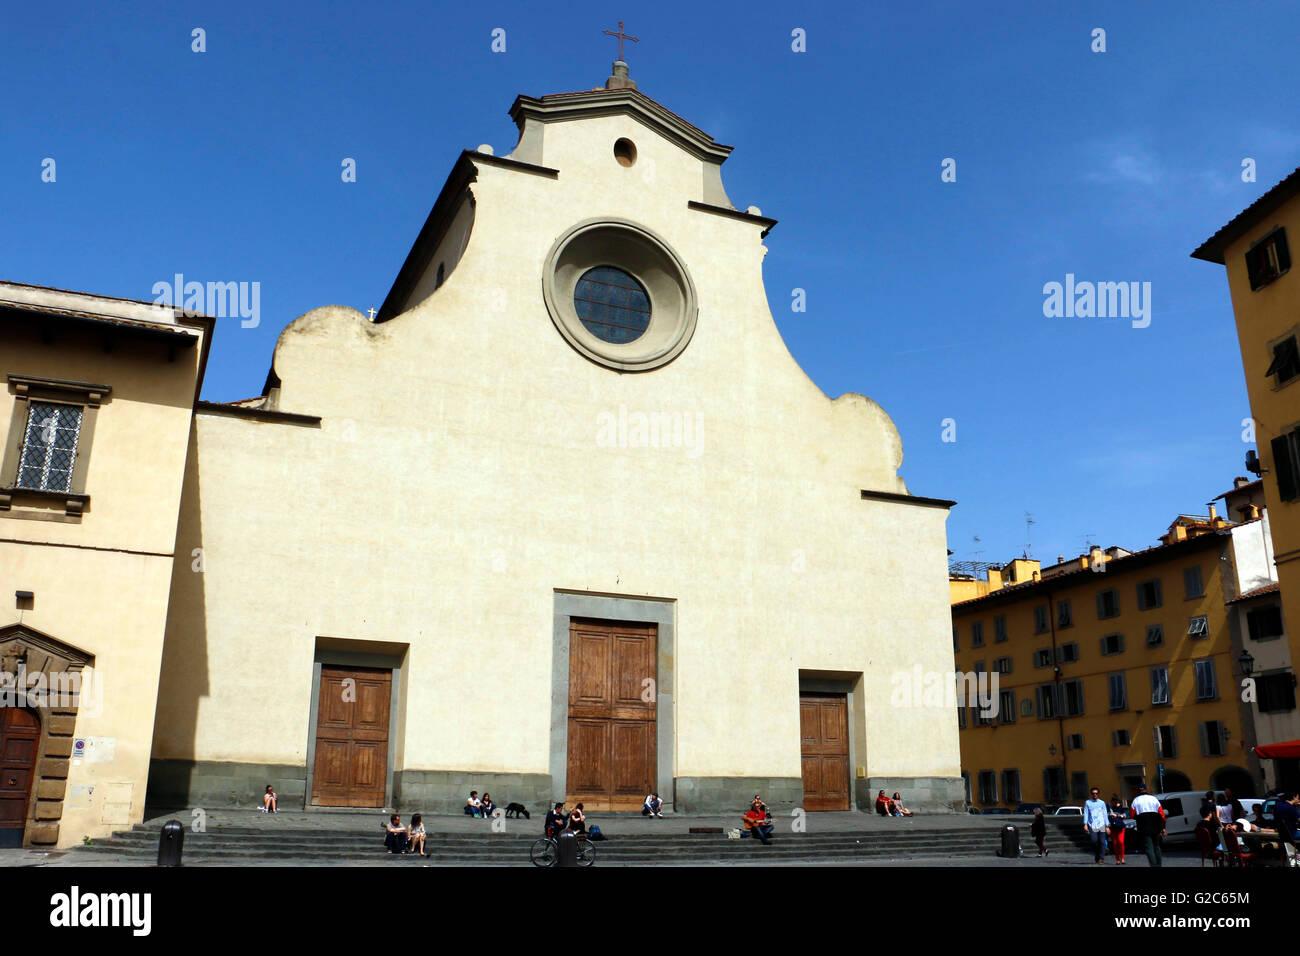 Chiesa di Santo Spirito,Florence,Italy - Stock Image